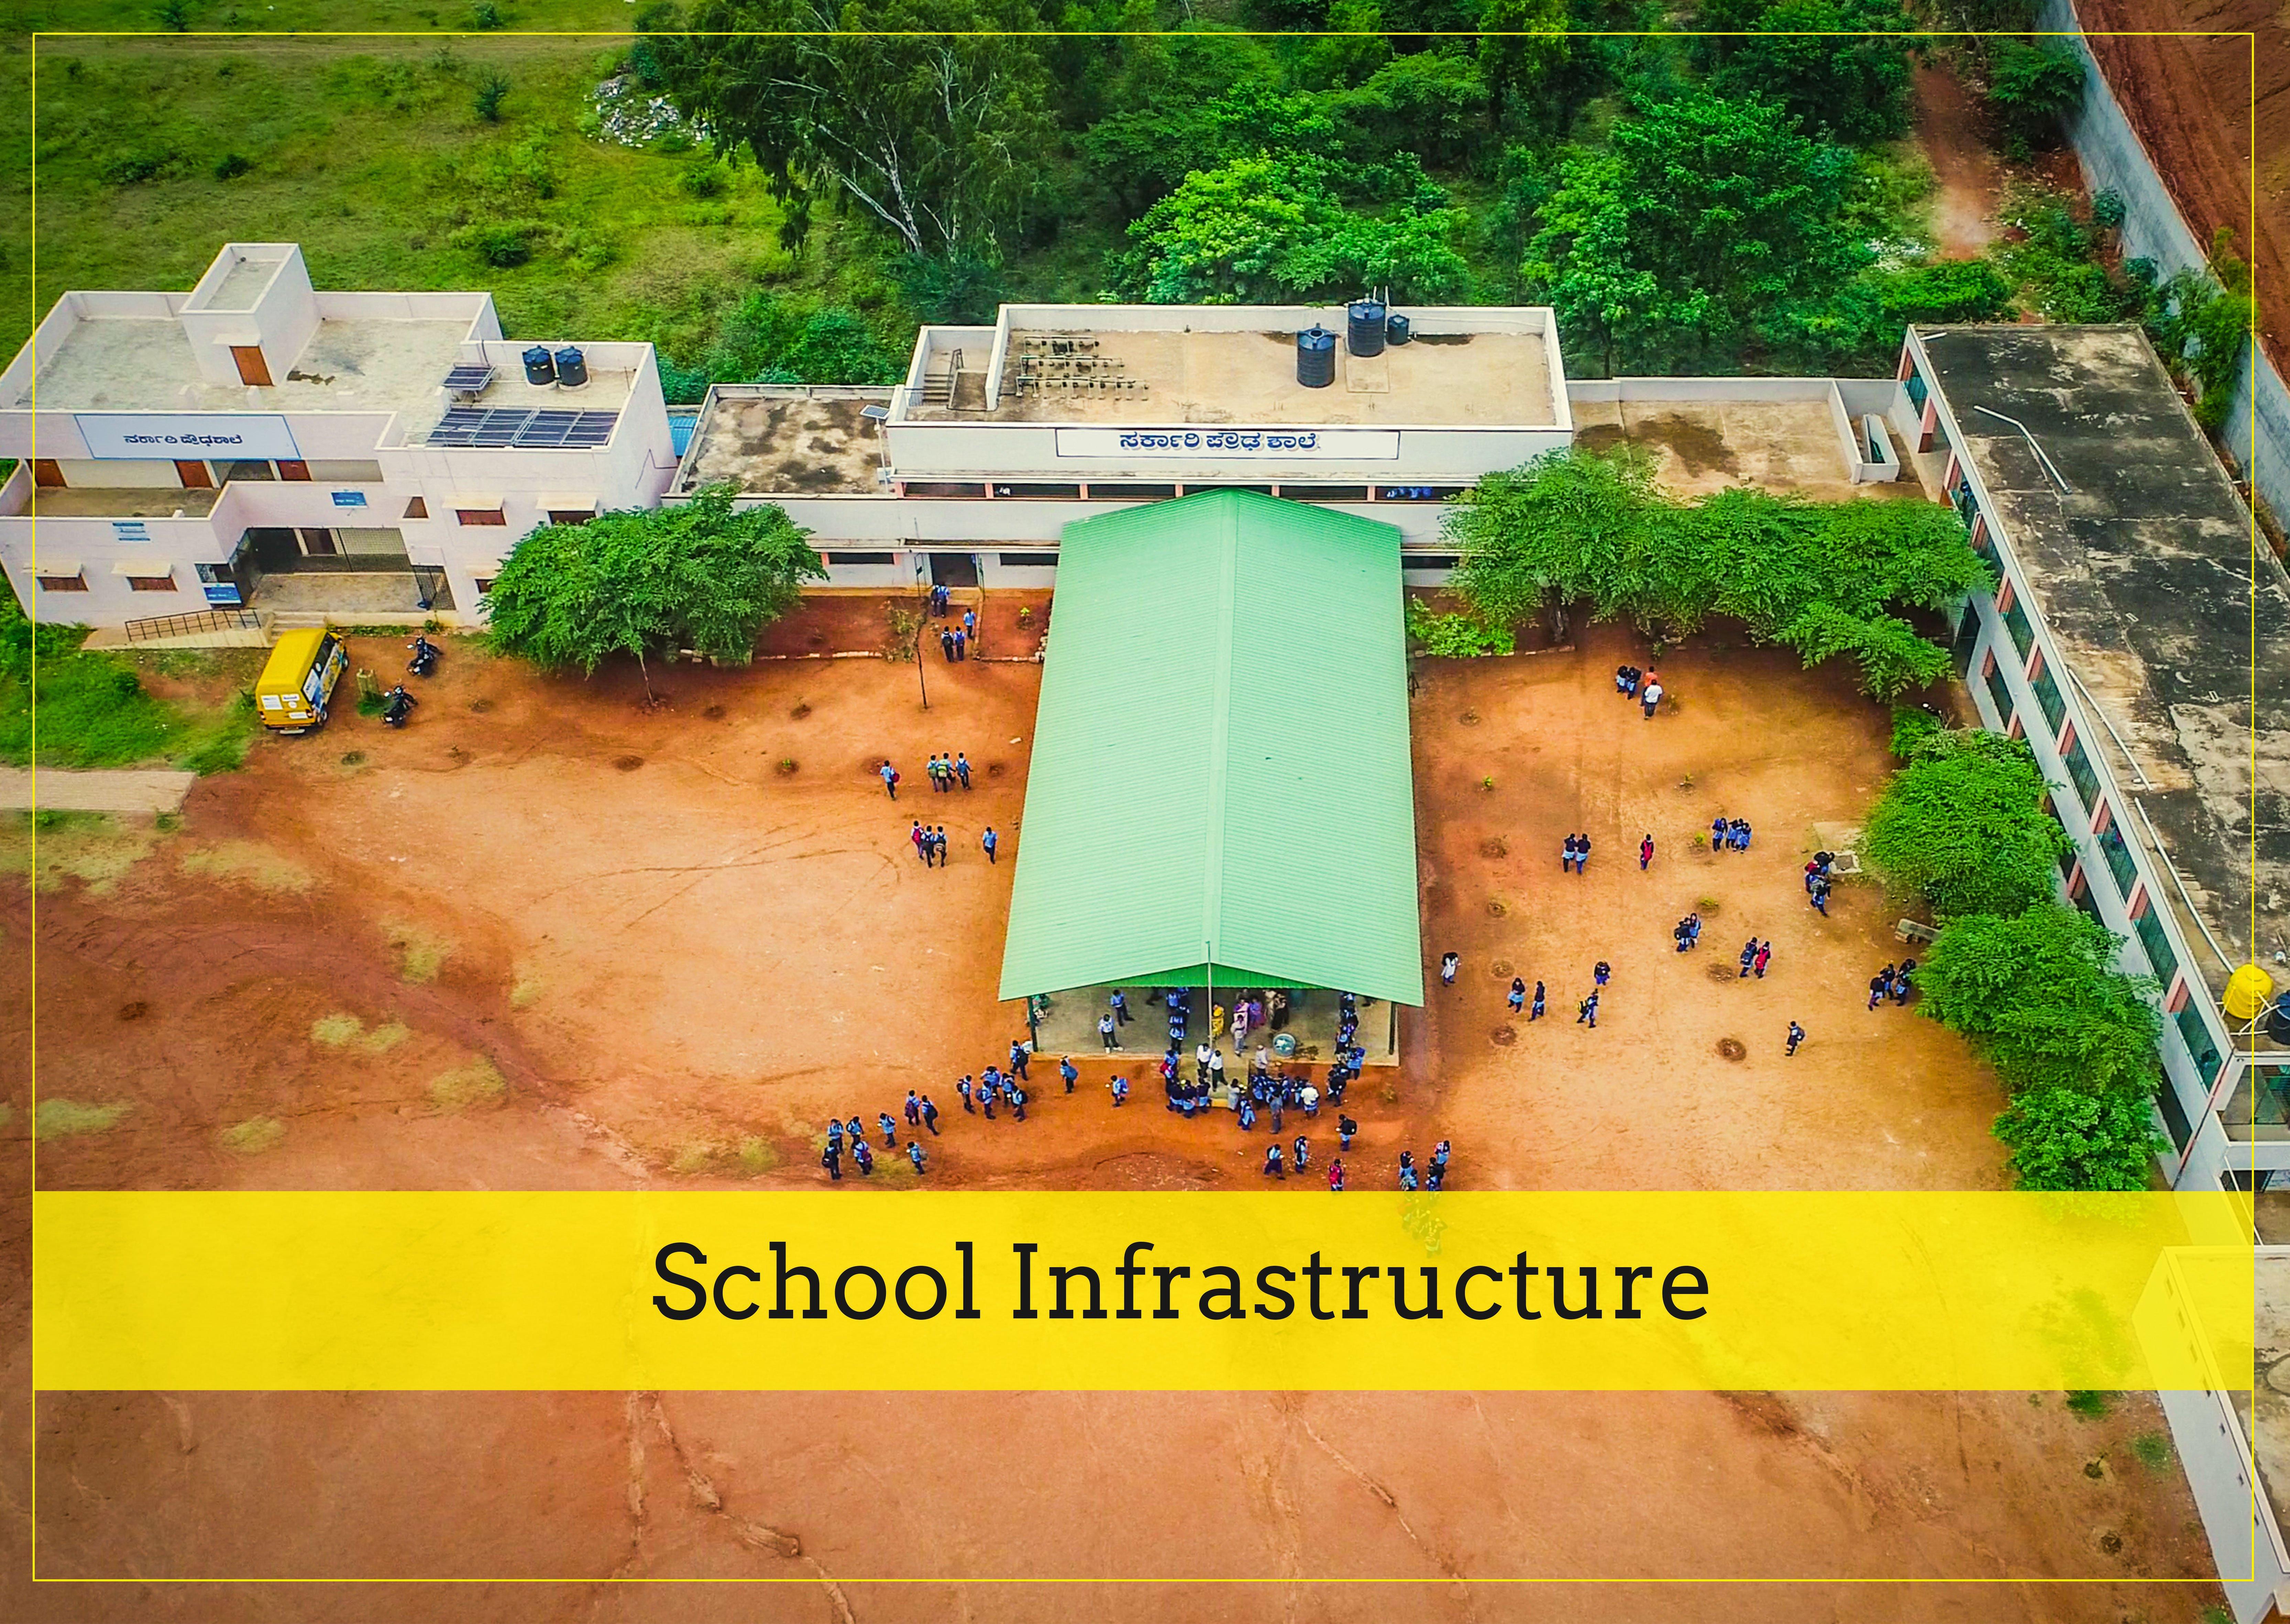 School-Infrastructure development by Bal Utsav